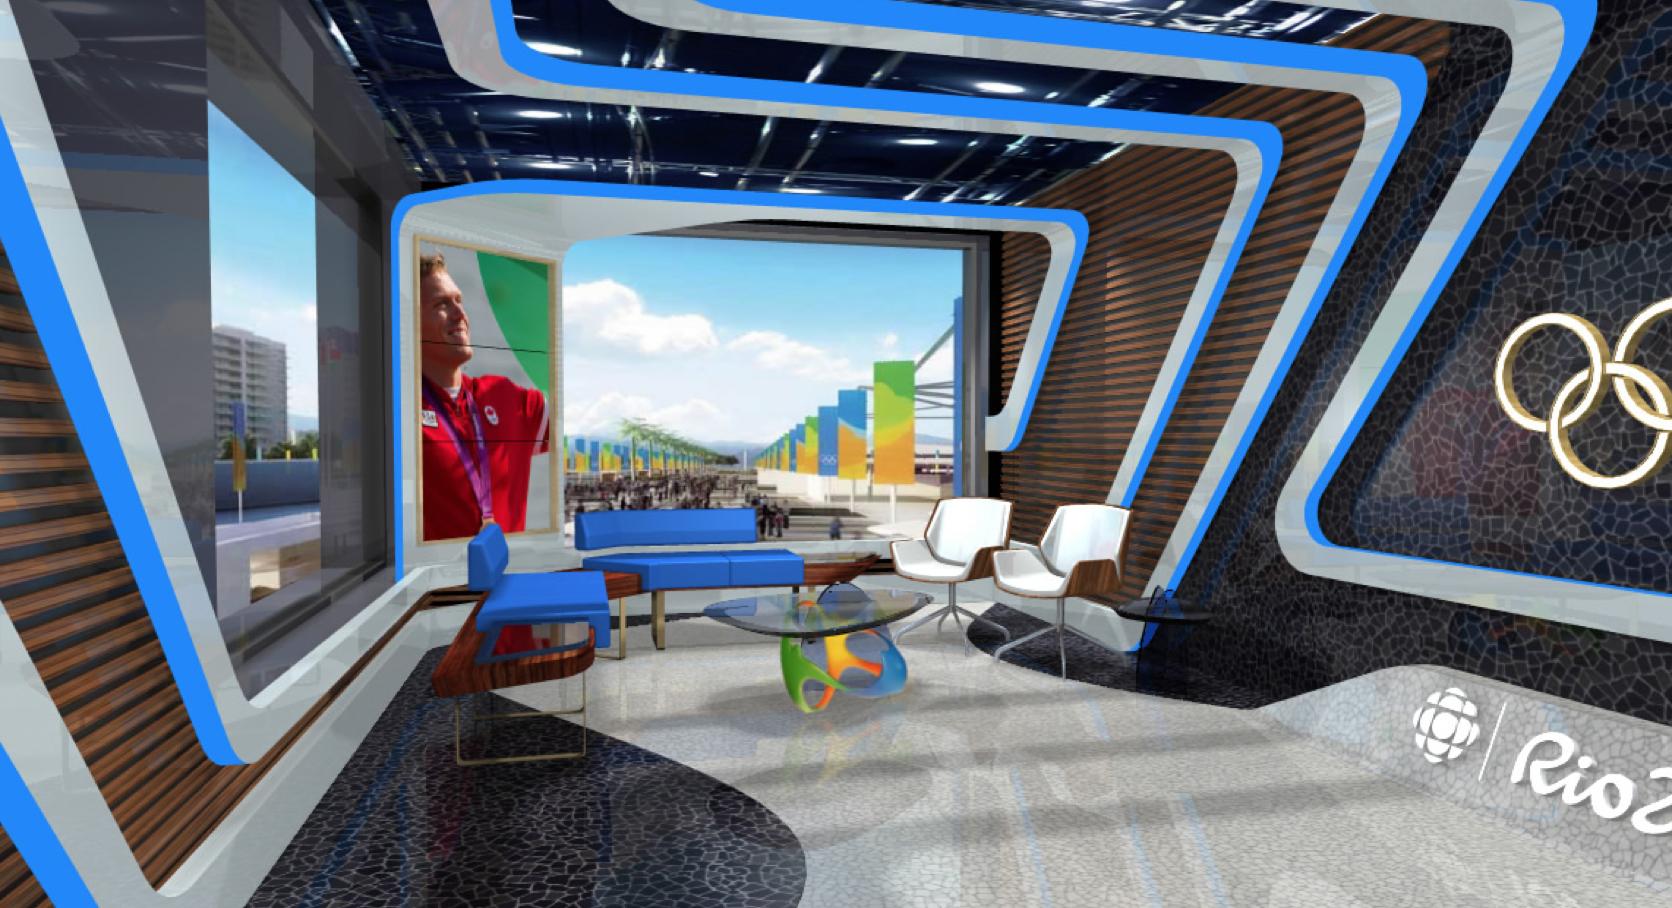 ncs_CBC-Rio-Olympics-TV-Studio_0010